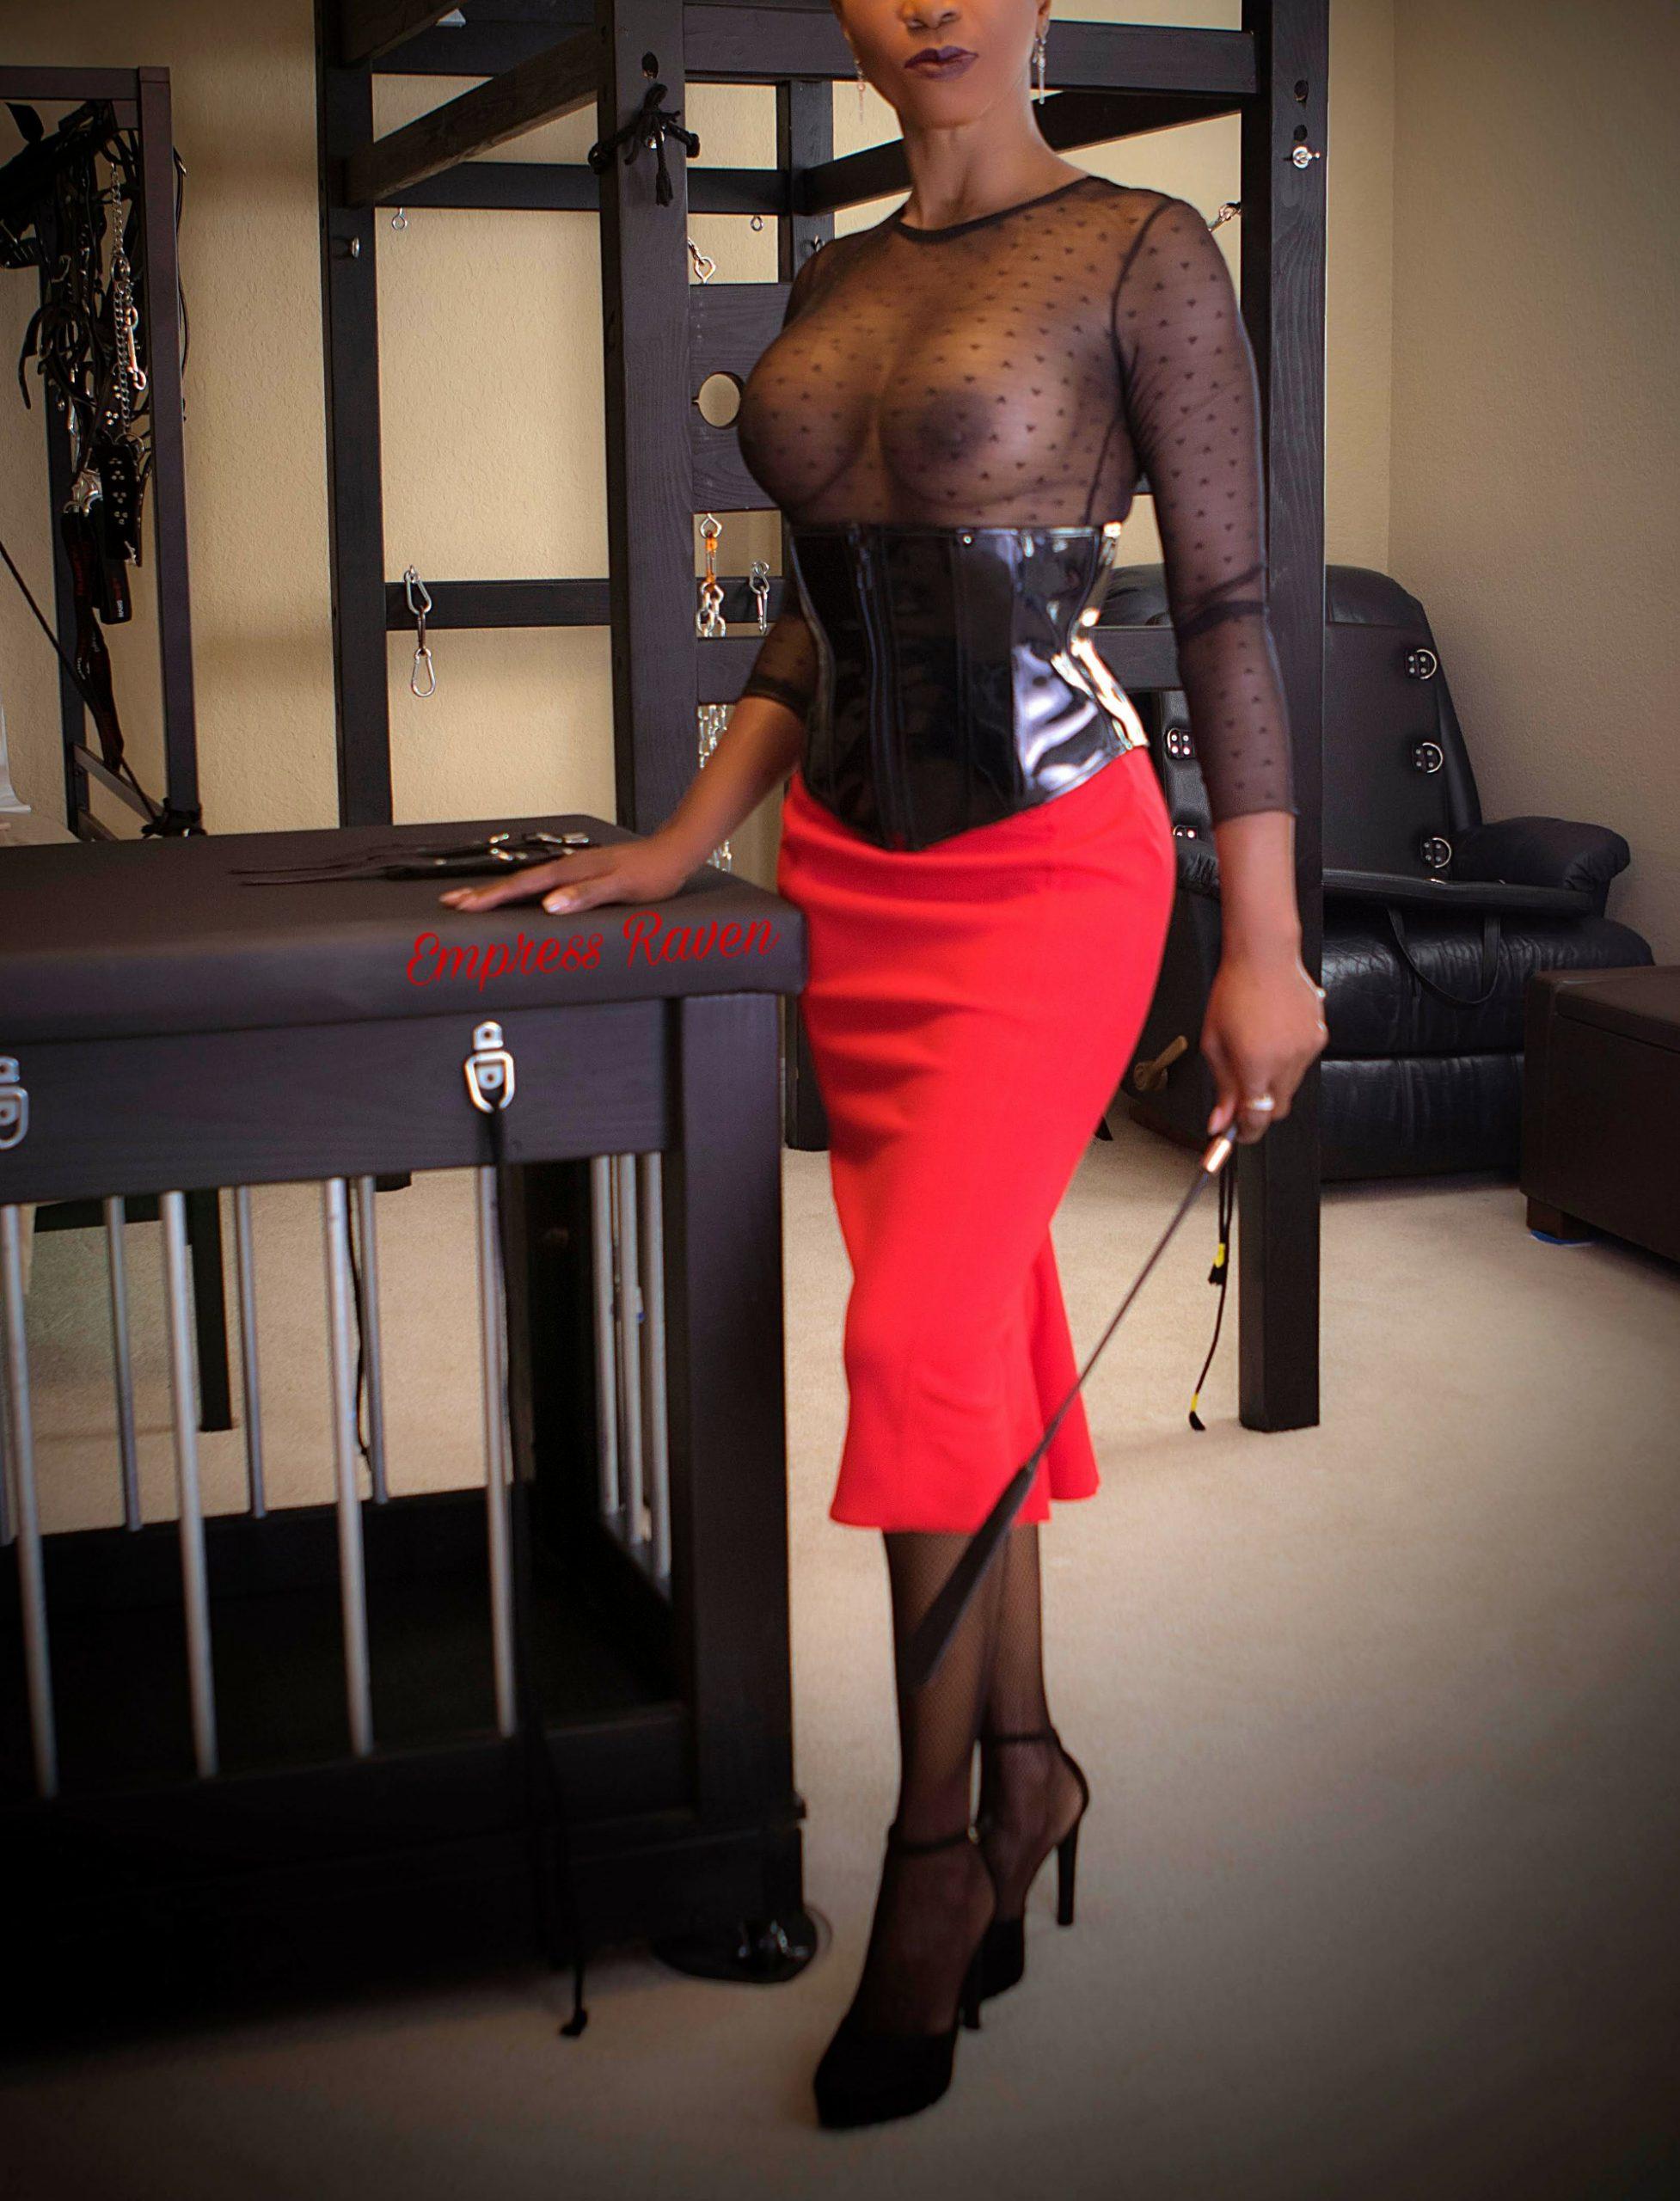 Testimonials for Empress Raven - Elite Dominatrix In Tampa Bay, Florida   Tampa Mistress, Bondmassage, Tampa Prostate Massage, ebony mistress, sensual Dominatrix, Empress Raven , Tampa Bay Dominatrix, bdsm, flr